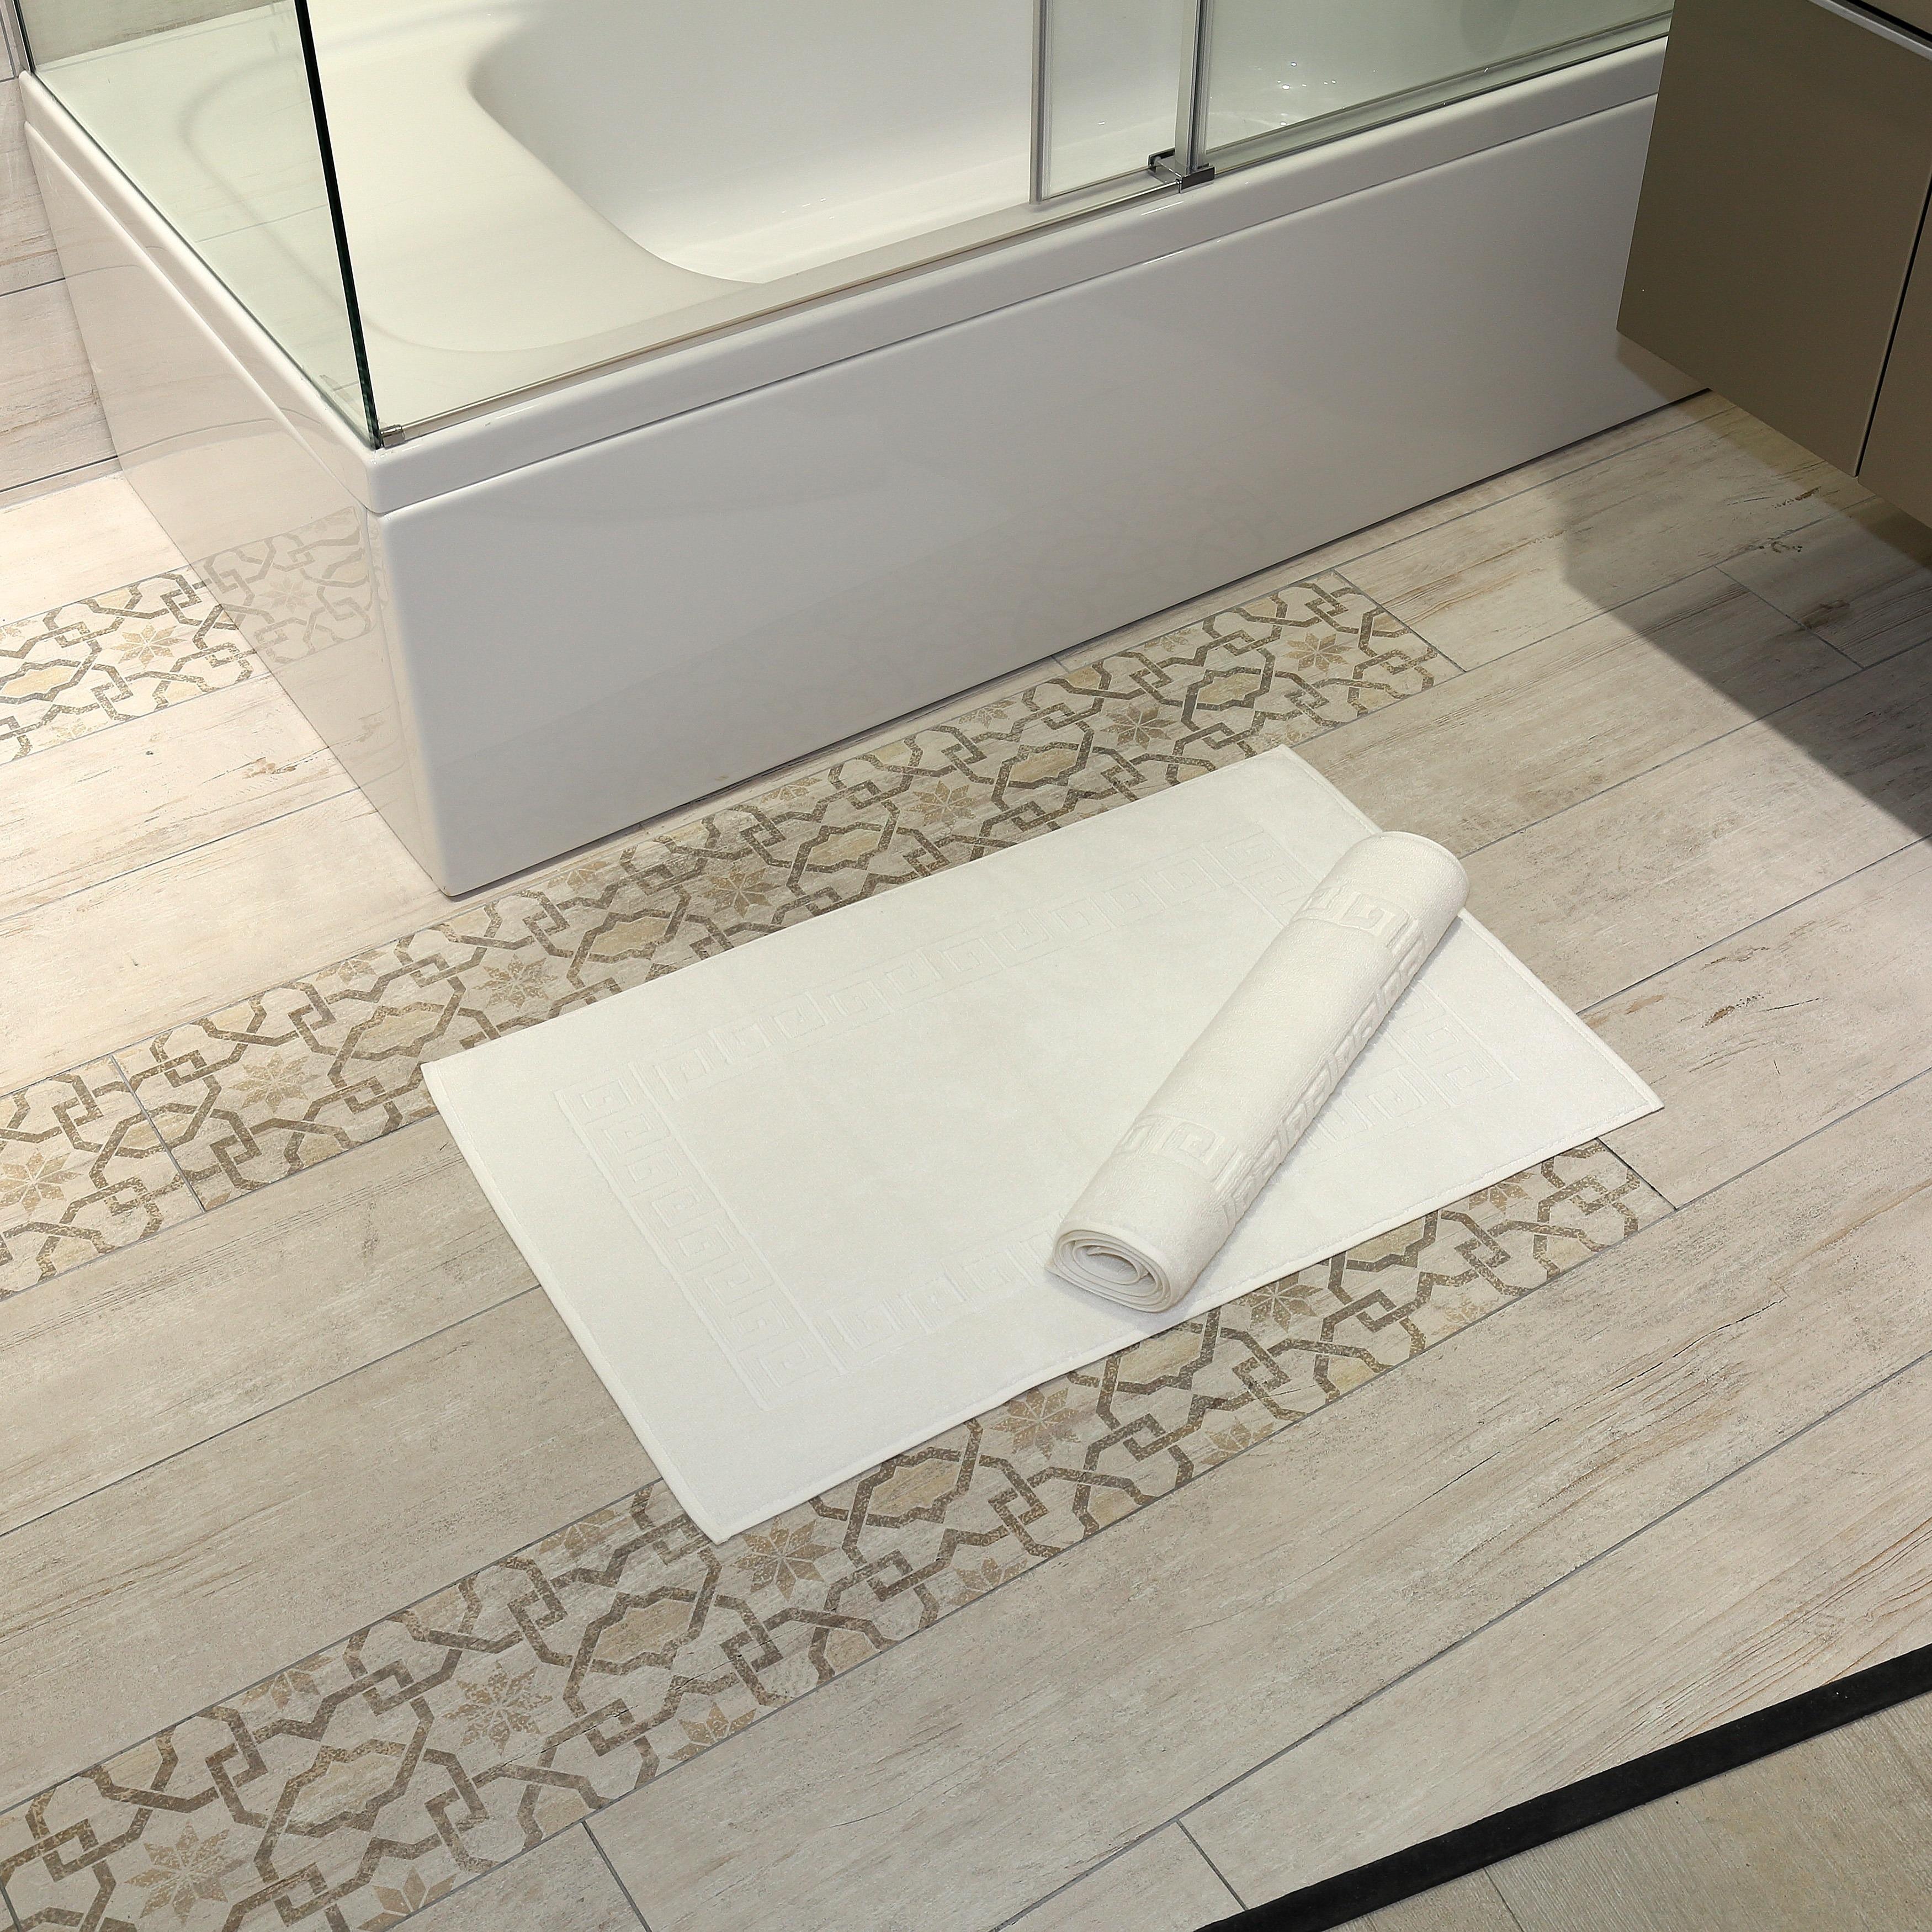 Authentic Hotel & Spa Greek Key Turkish Cotton Bath Mats ...